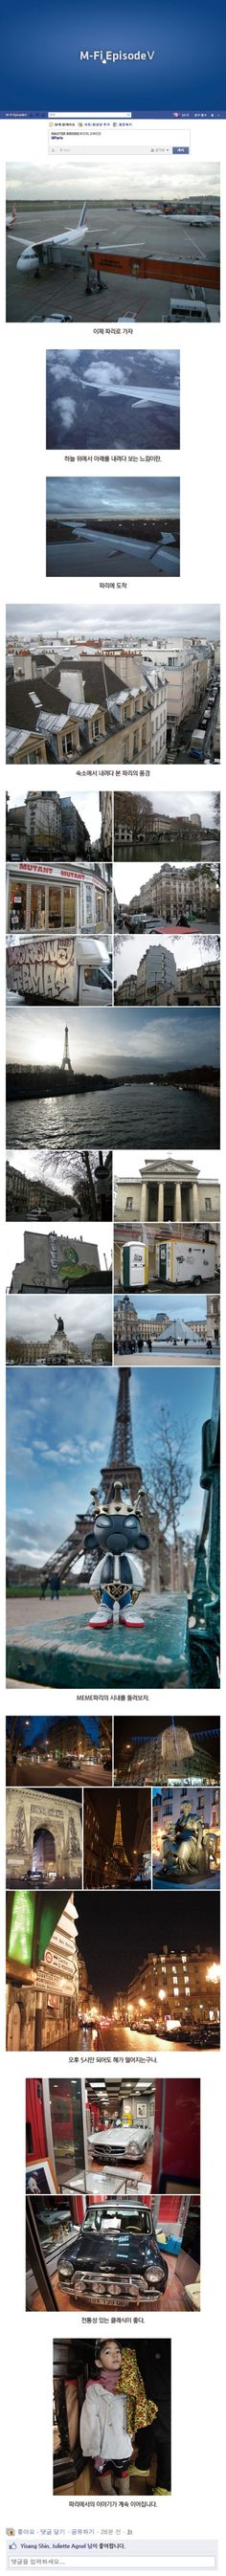 M-Fi《Episode》∥ Art & Culture // WORLD WIDE :: Paris : 네이버 블로그